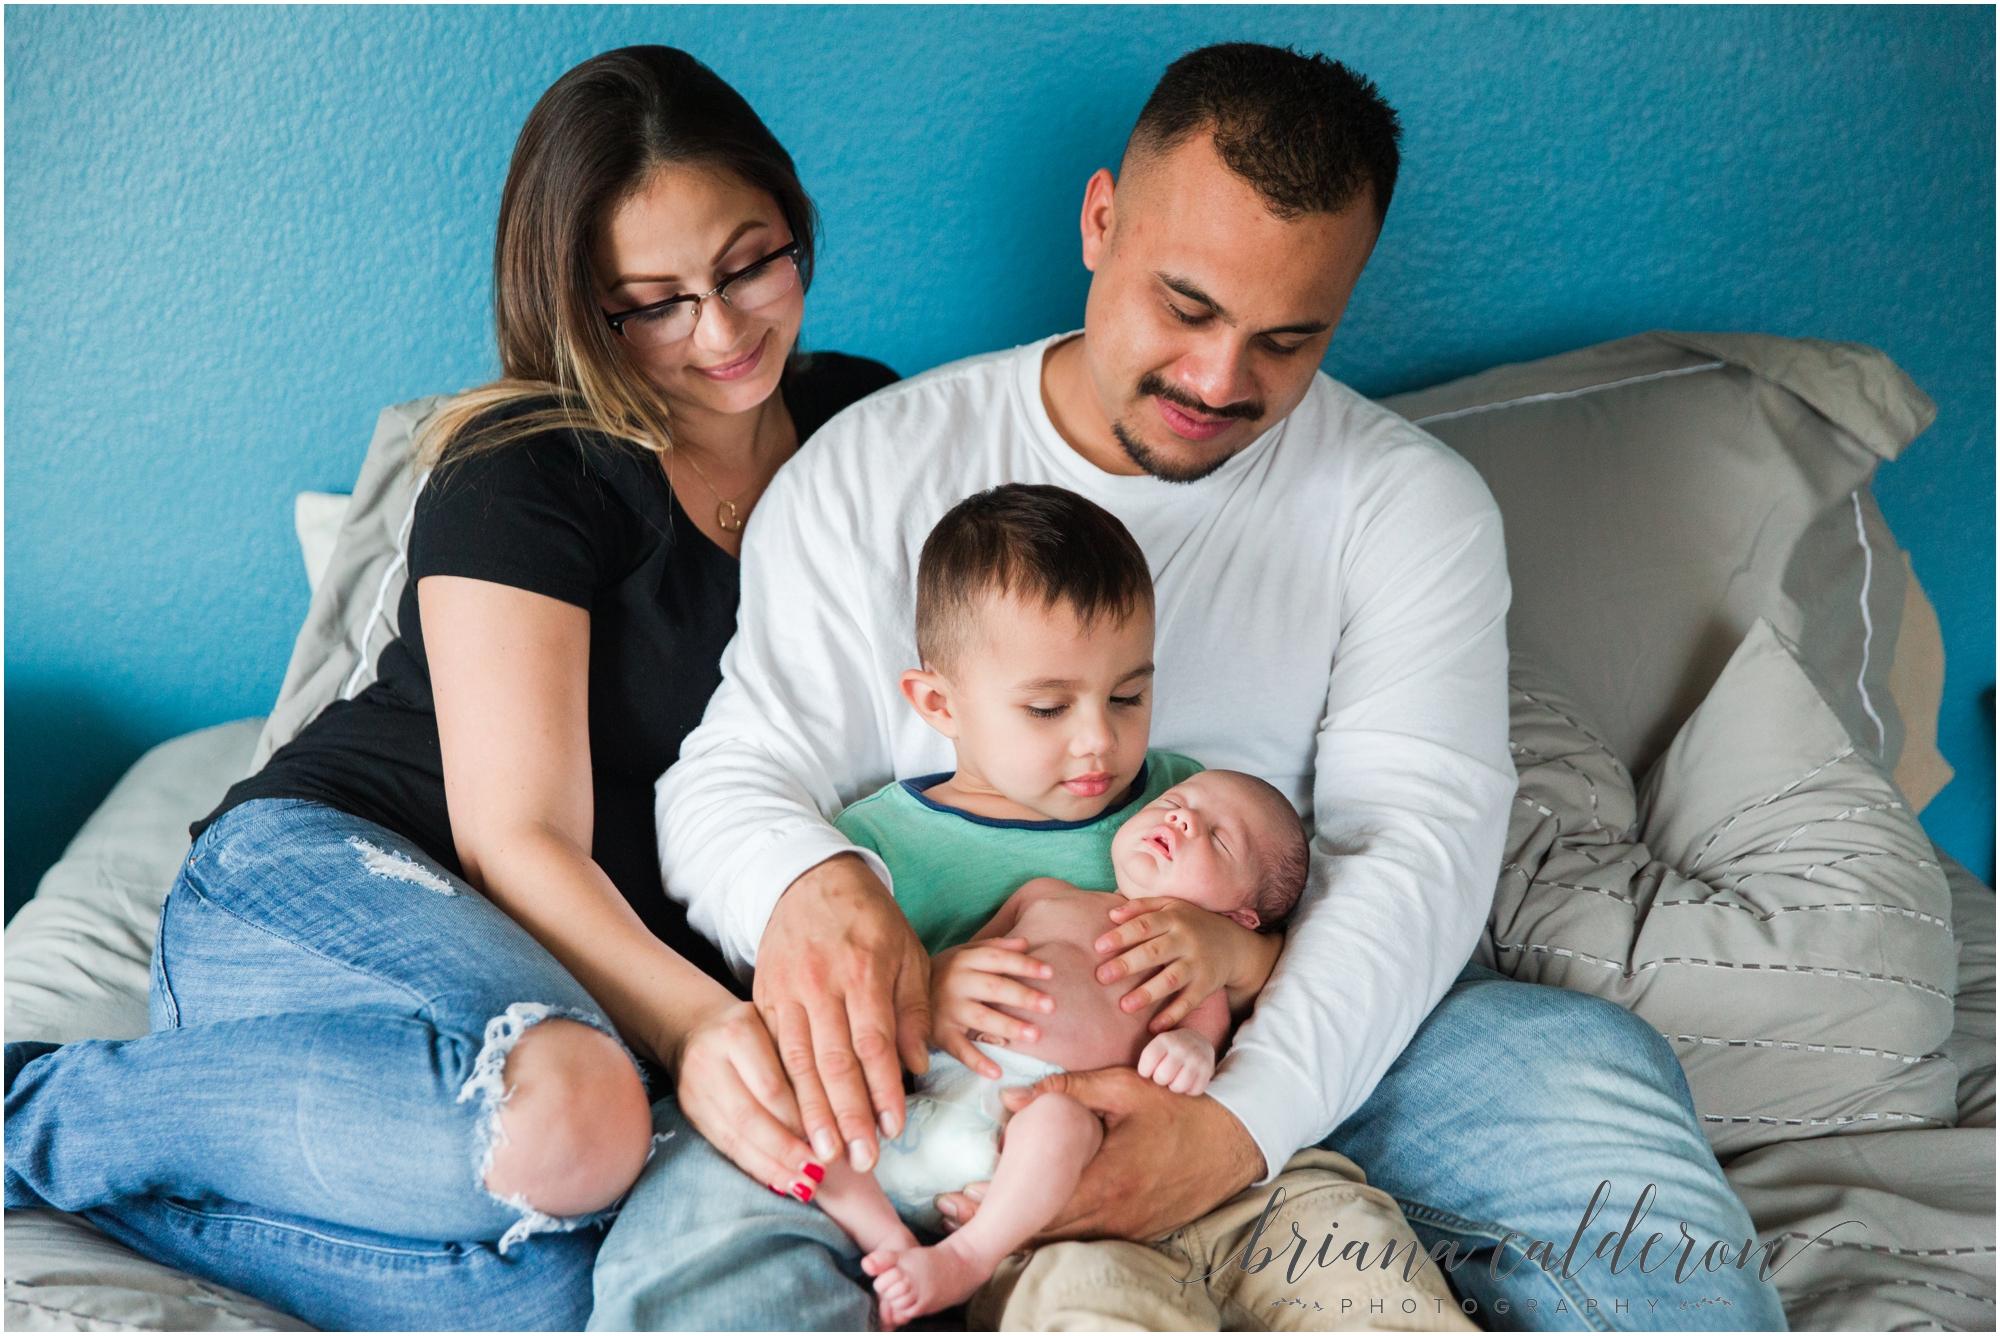 Bay Area lifestyle newbornpictures by Briana Calderon Photography_1401.jpg